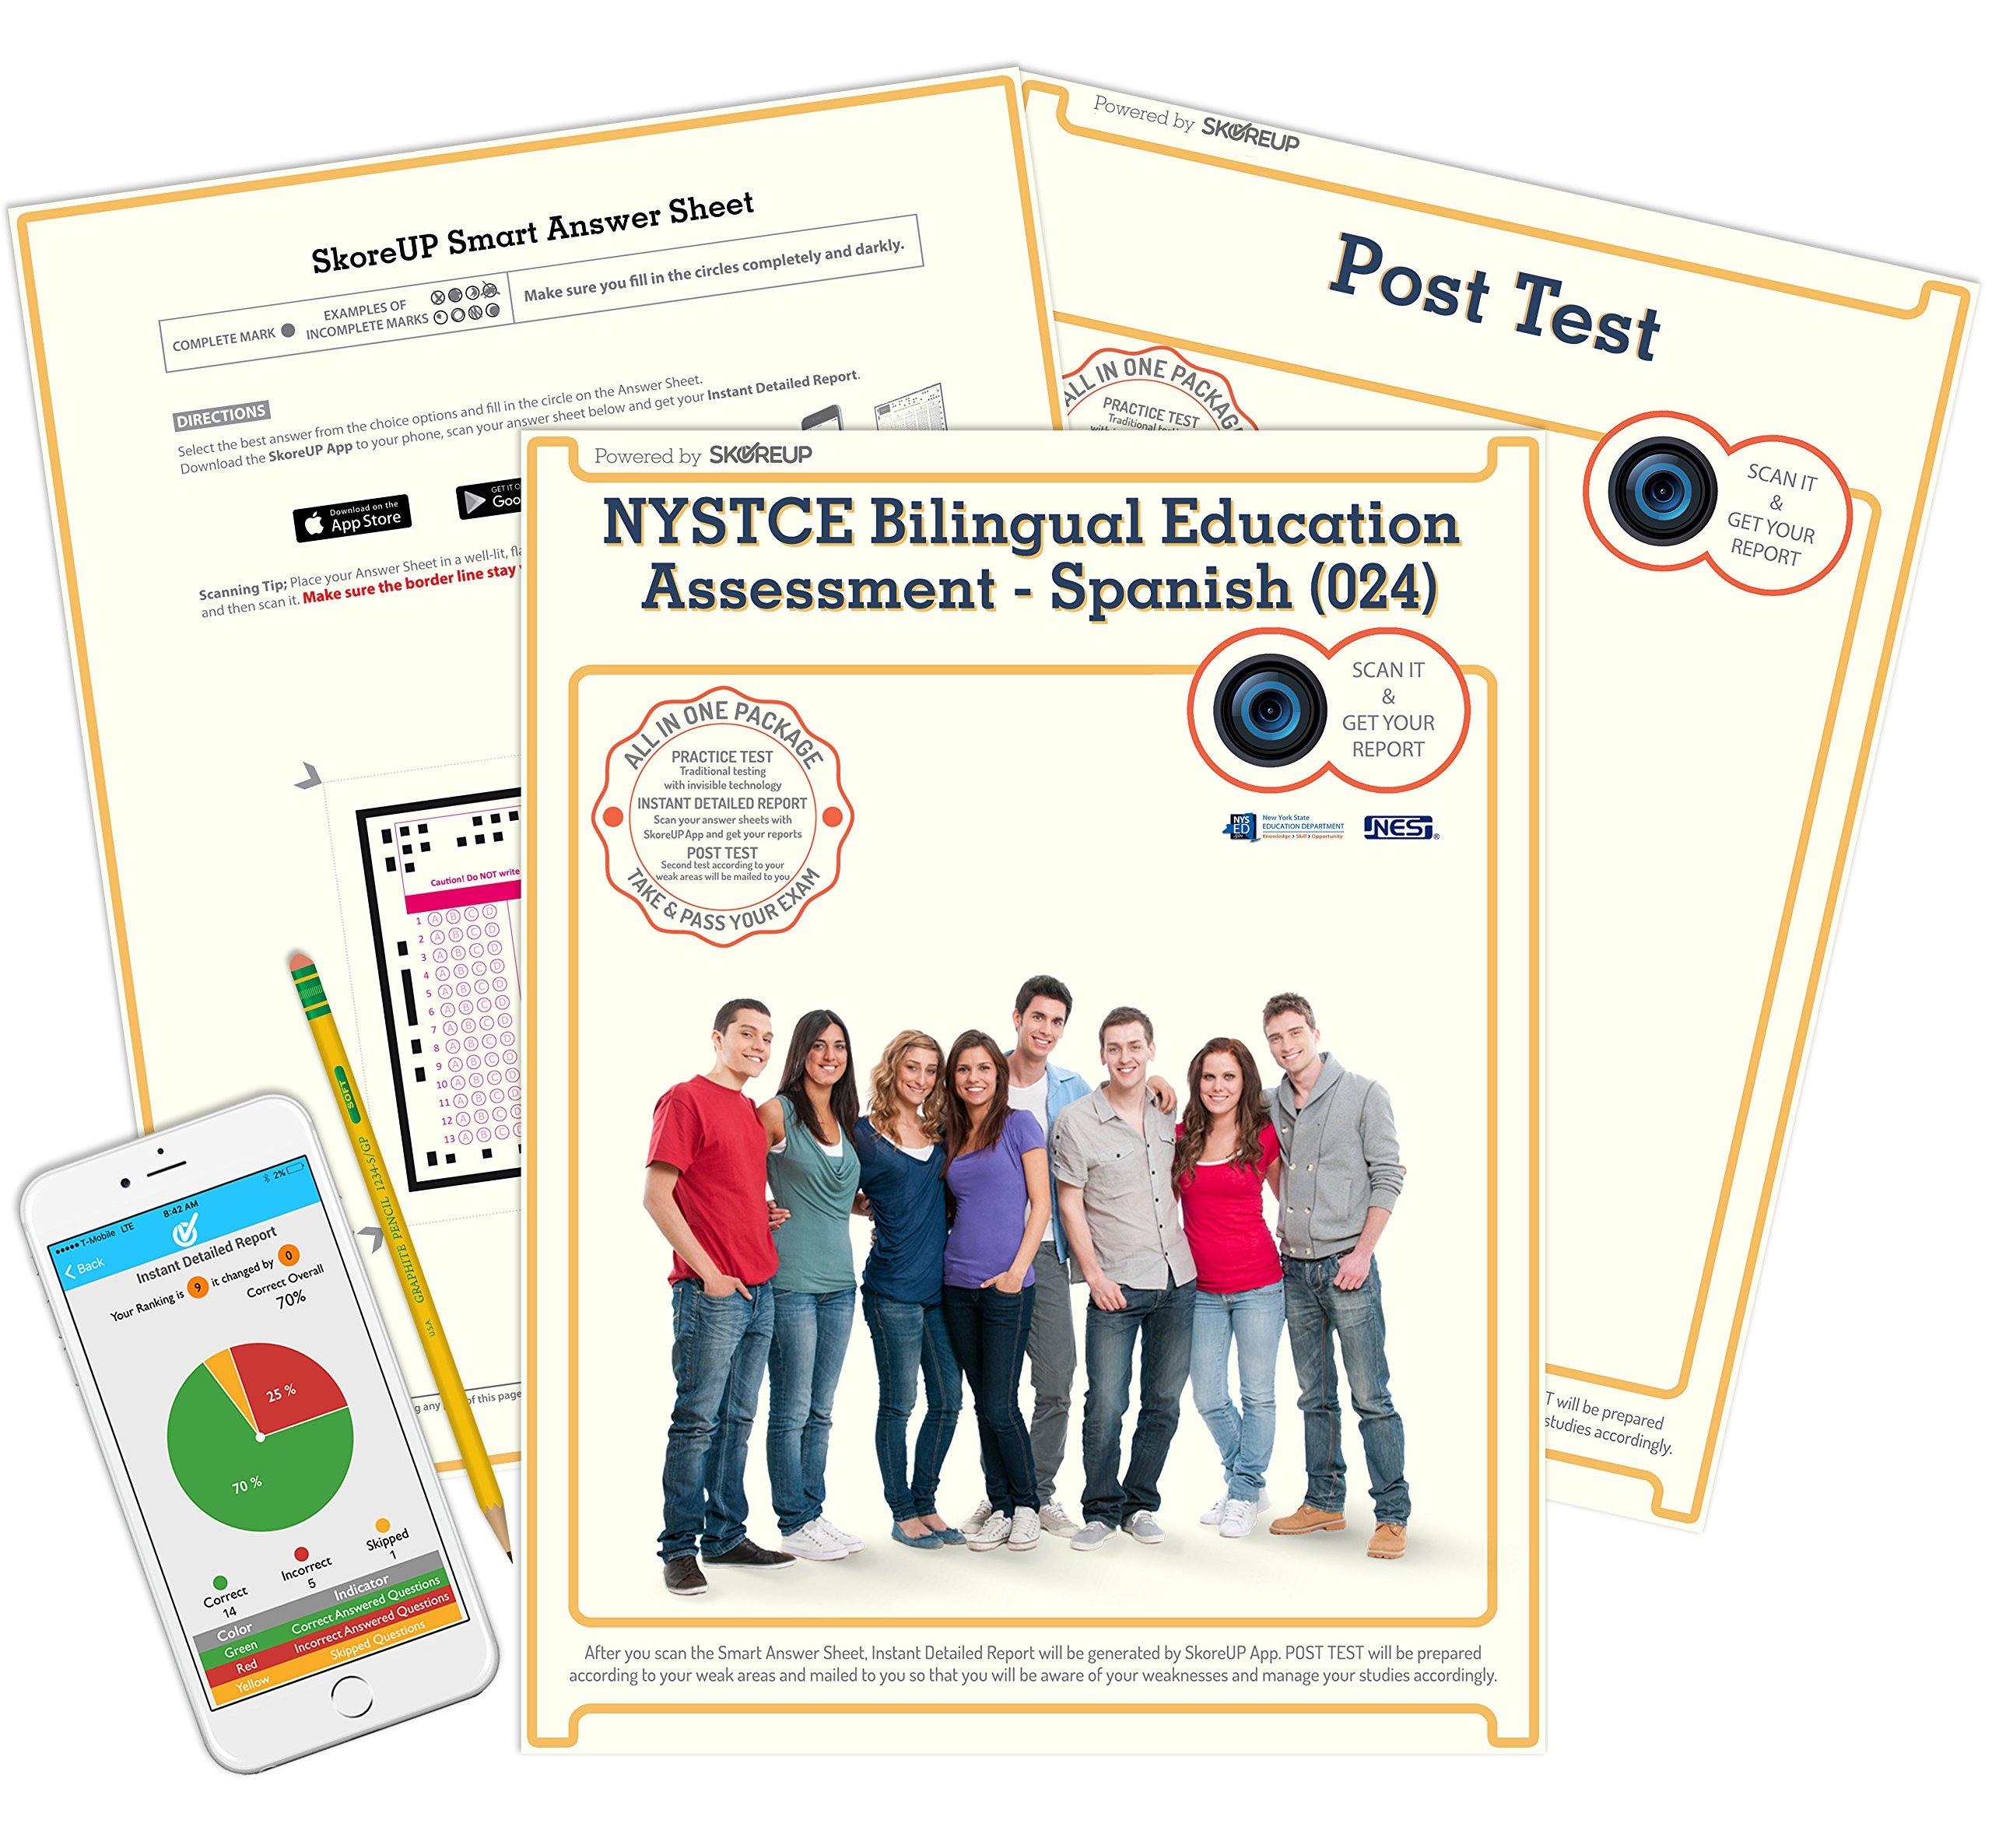 Nystce Bilingual Education Assessment Spanish 024 Test New York